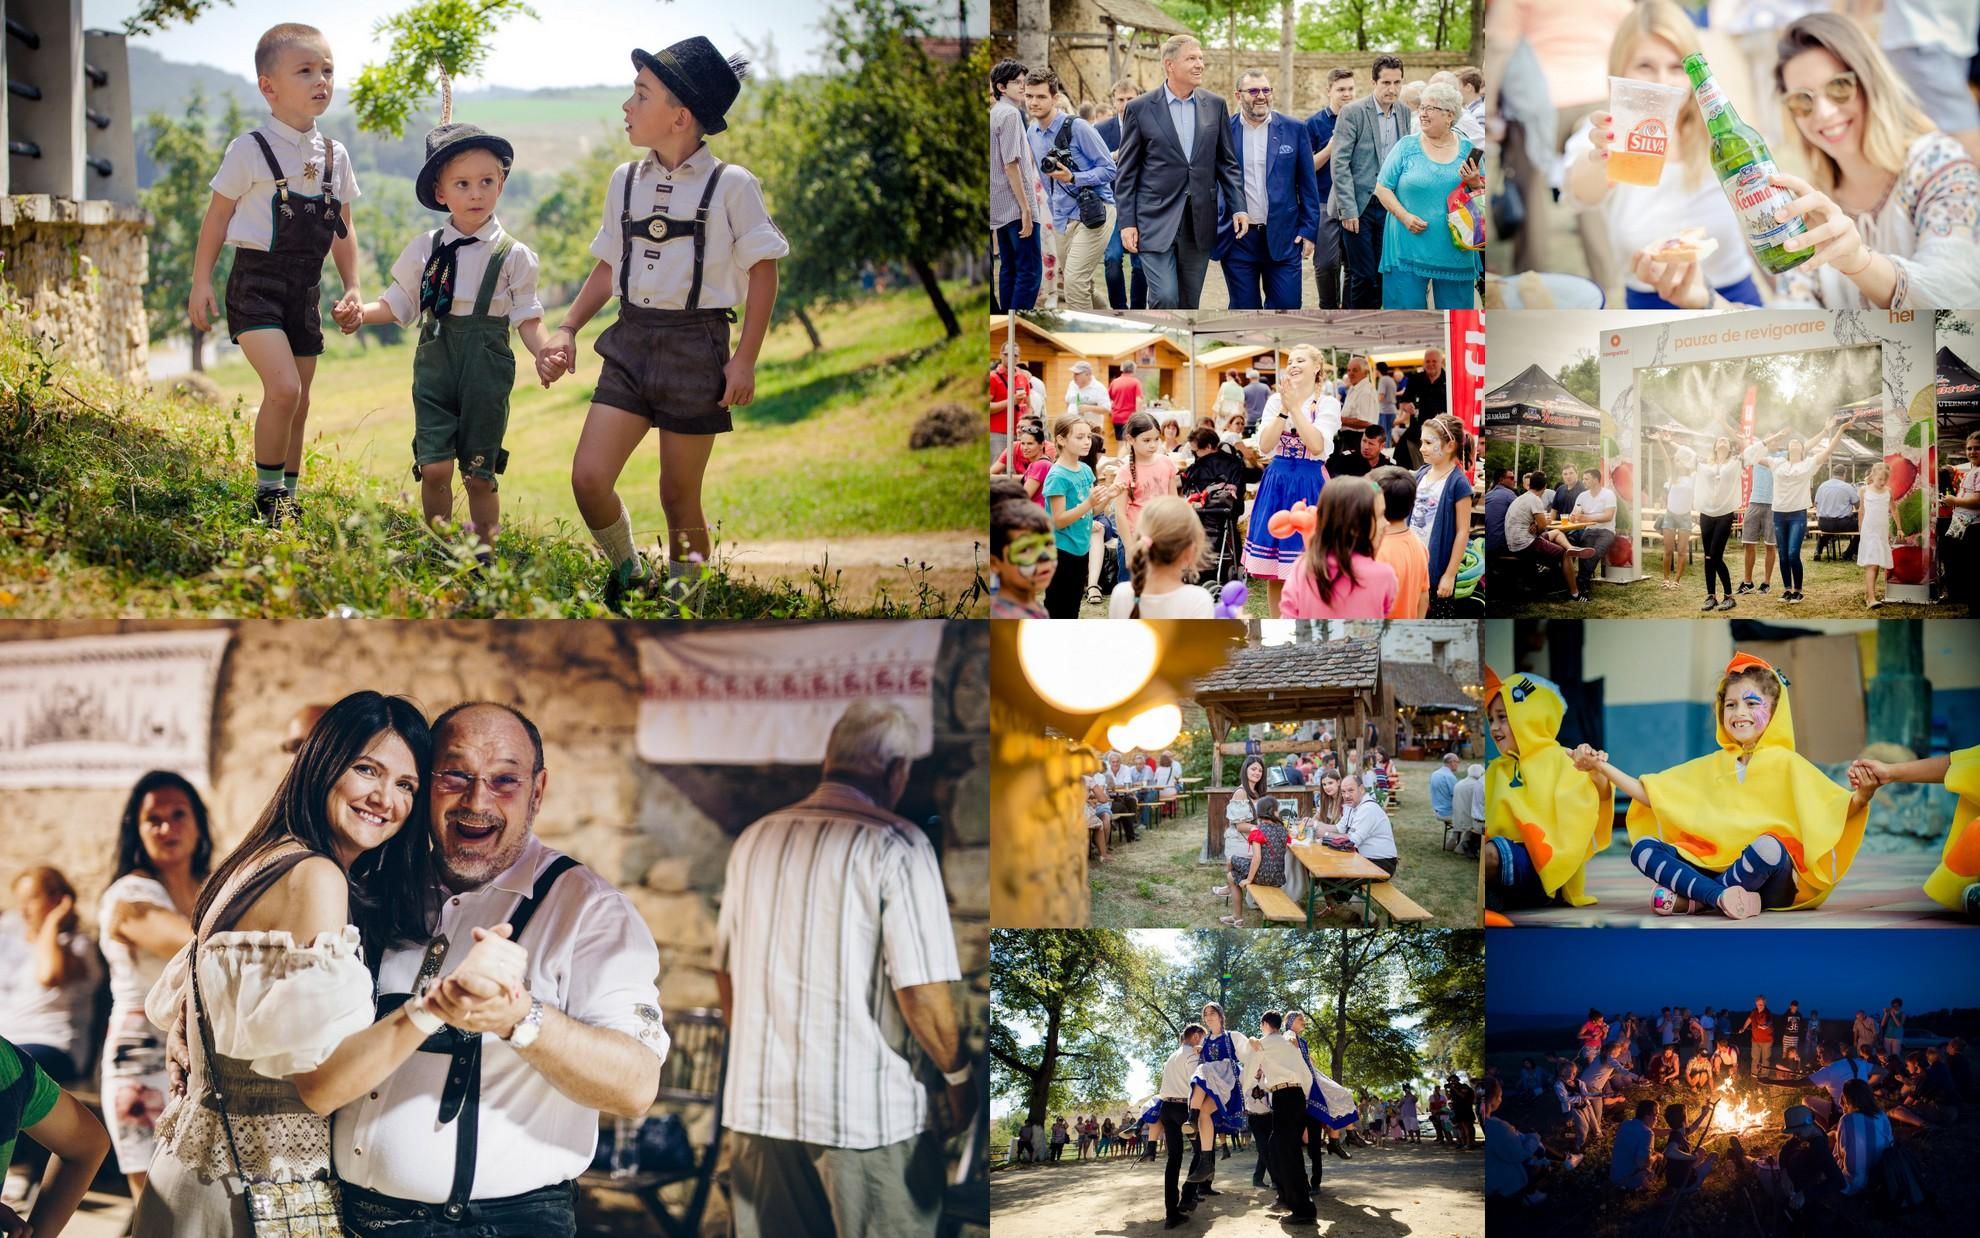 Festivalul Saptamana Haferland 2017